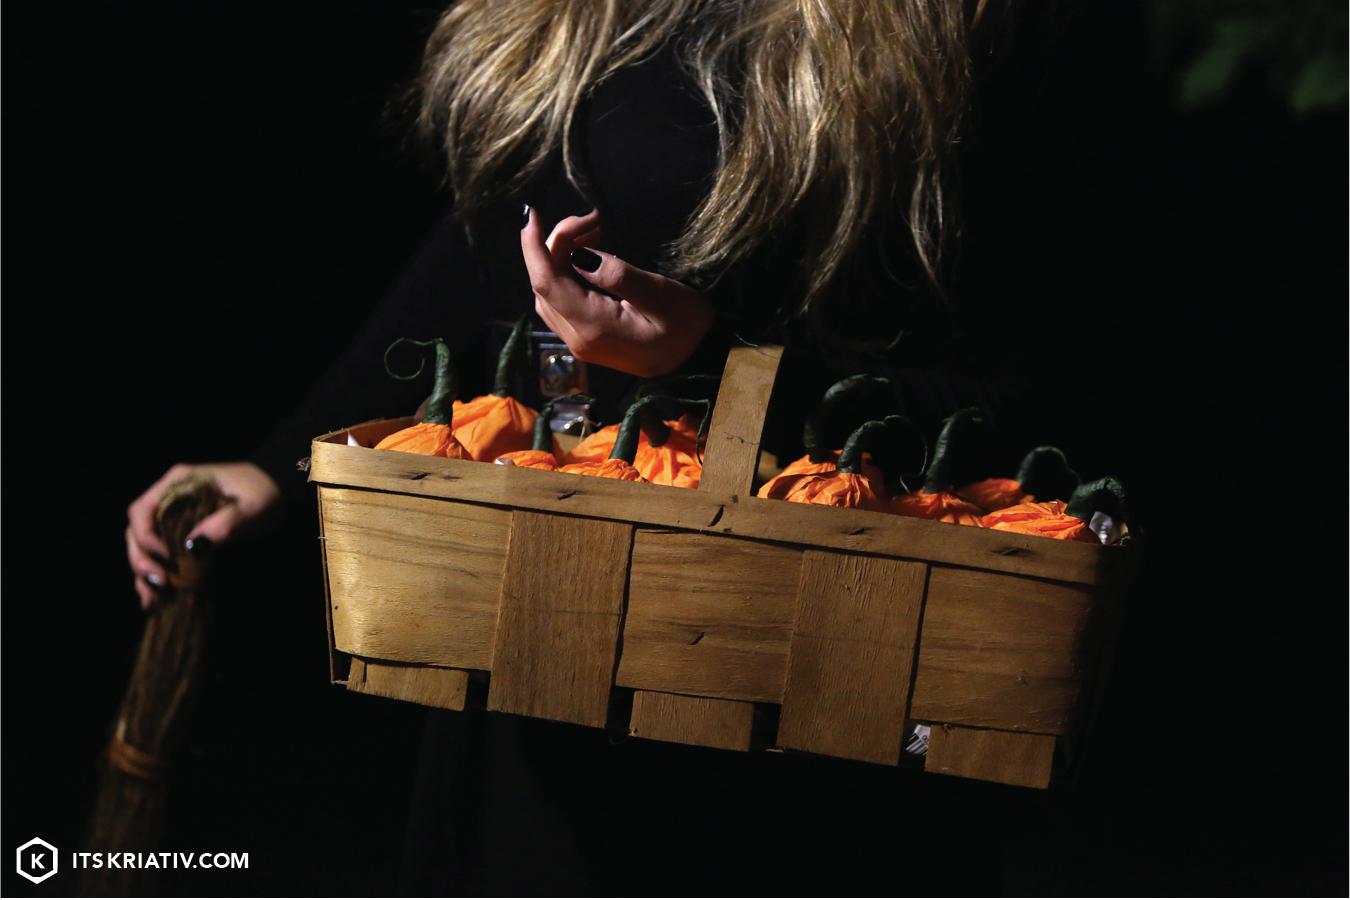 Oct_13_Fashion-Halloween-Witch-01a-02.jpg